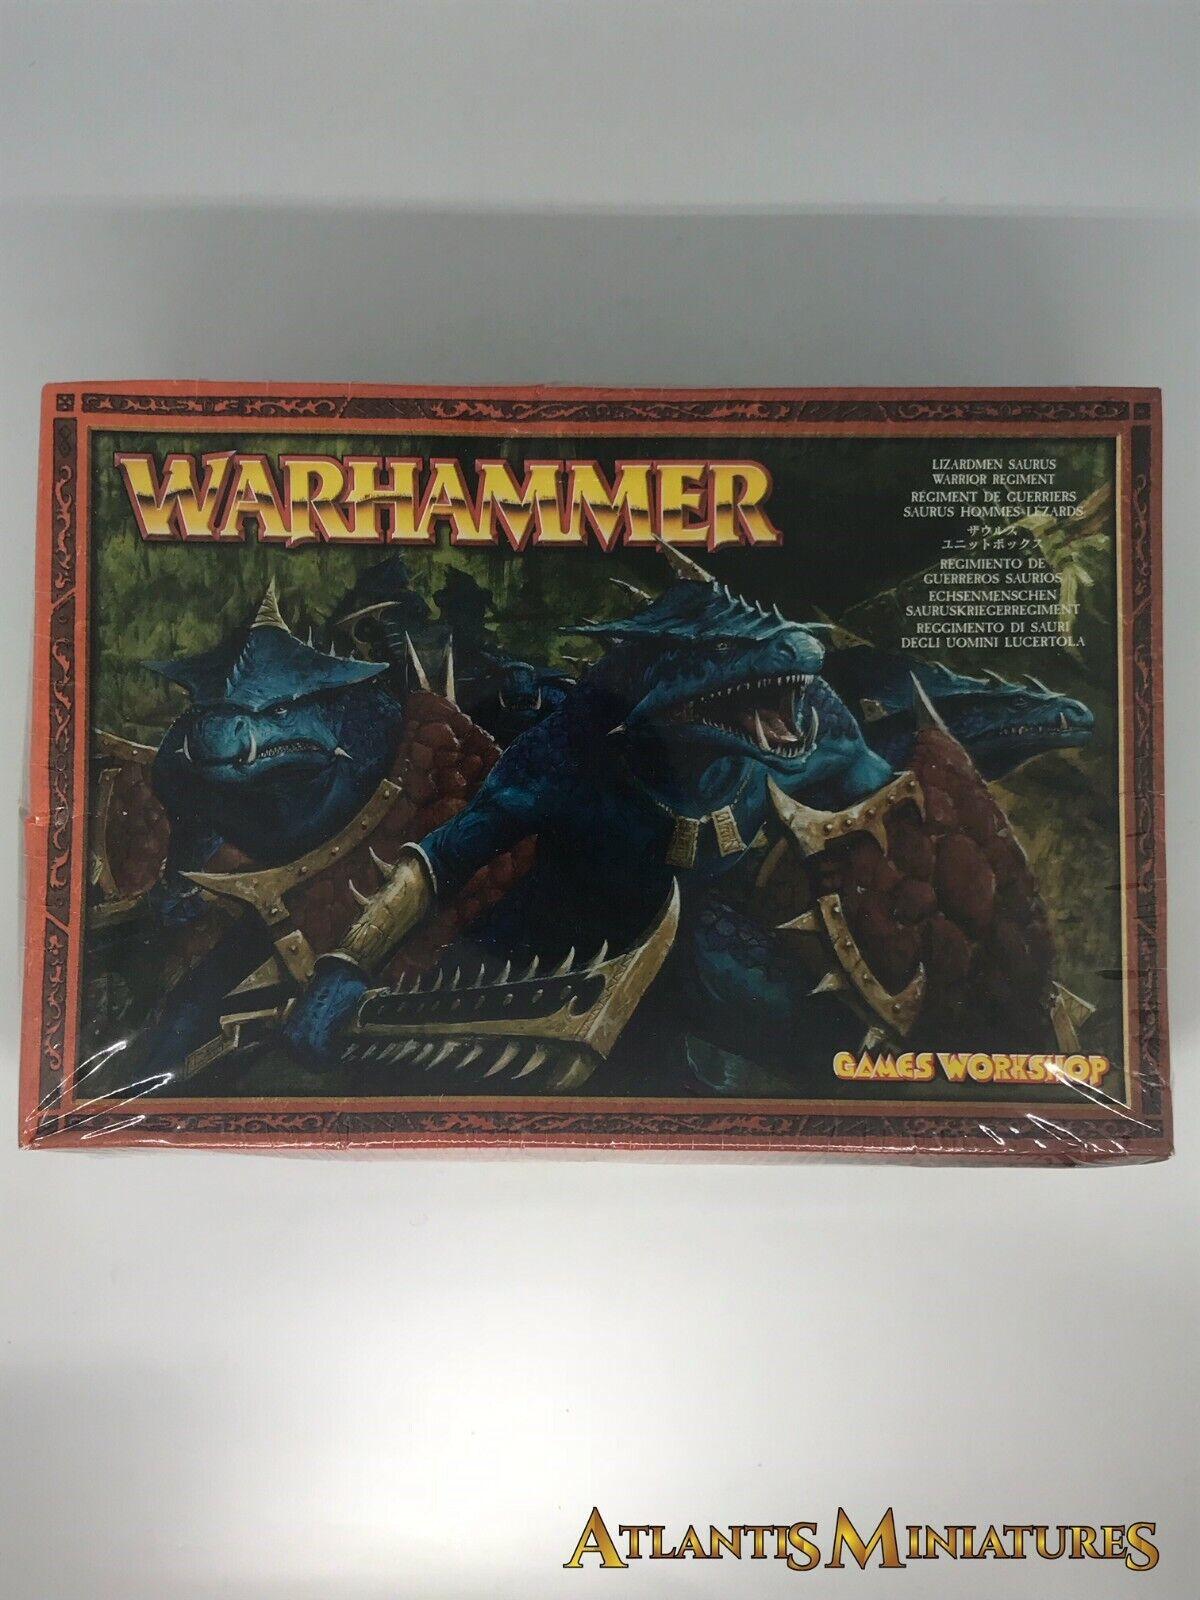 Lizardmen Saurus Regiment Boxed - OOP - Warhammer Age of Sigmar CC153